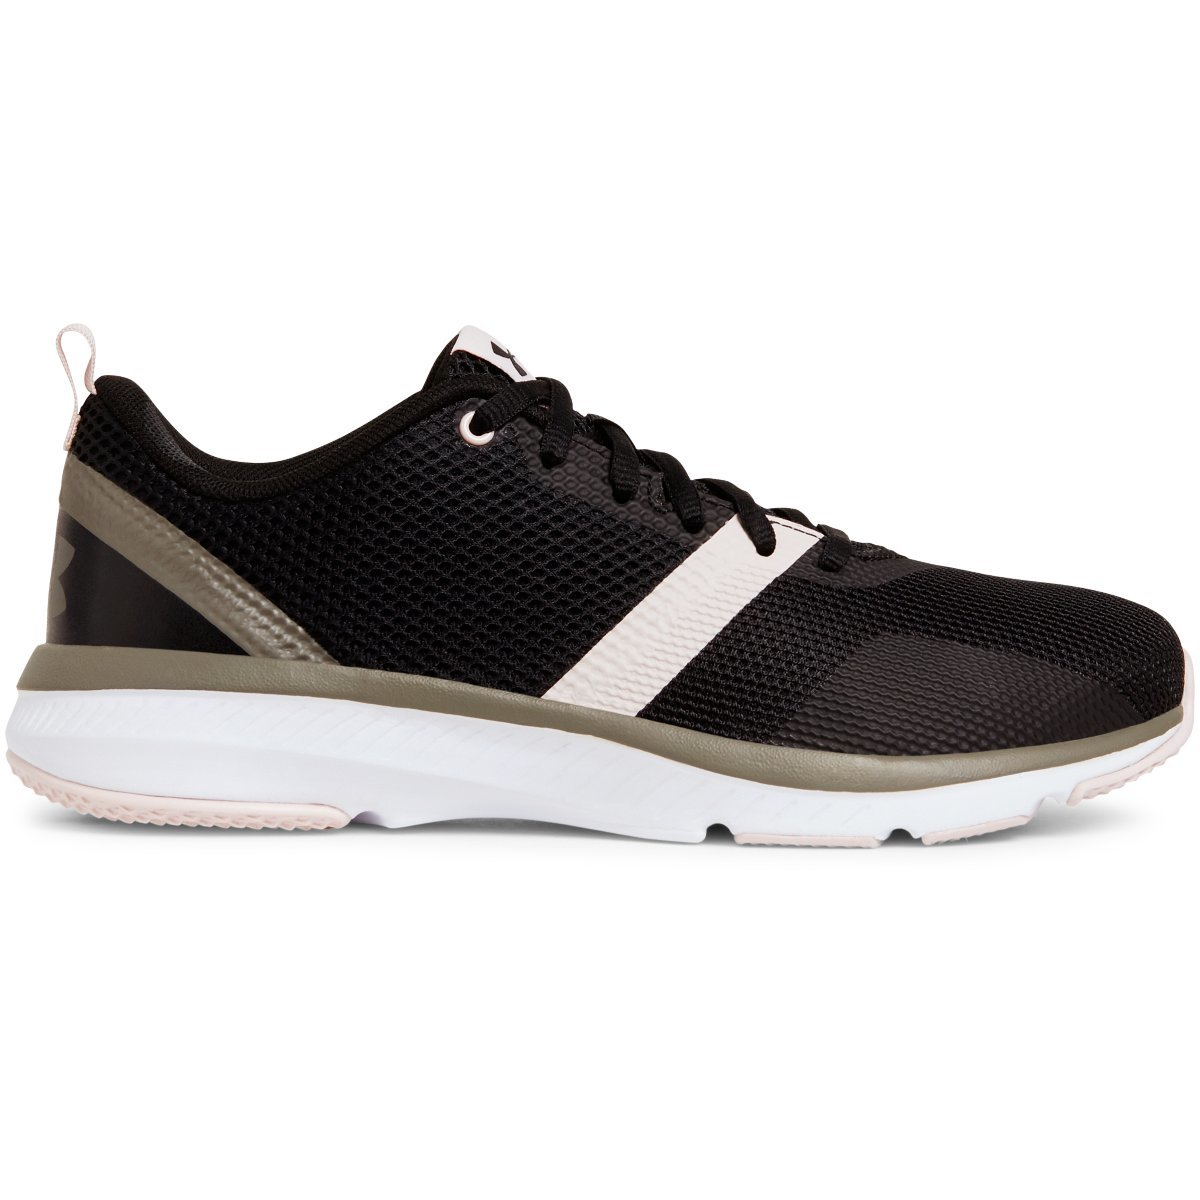 Under Armour Women's Press 2 Cross-Training Shoes - Black, 9